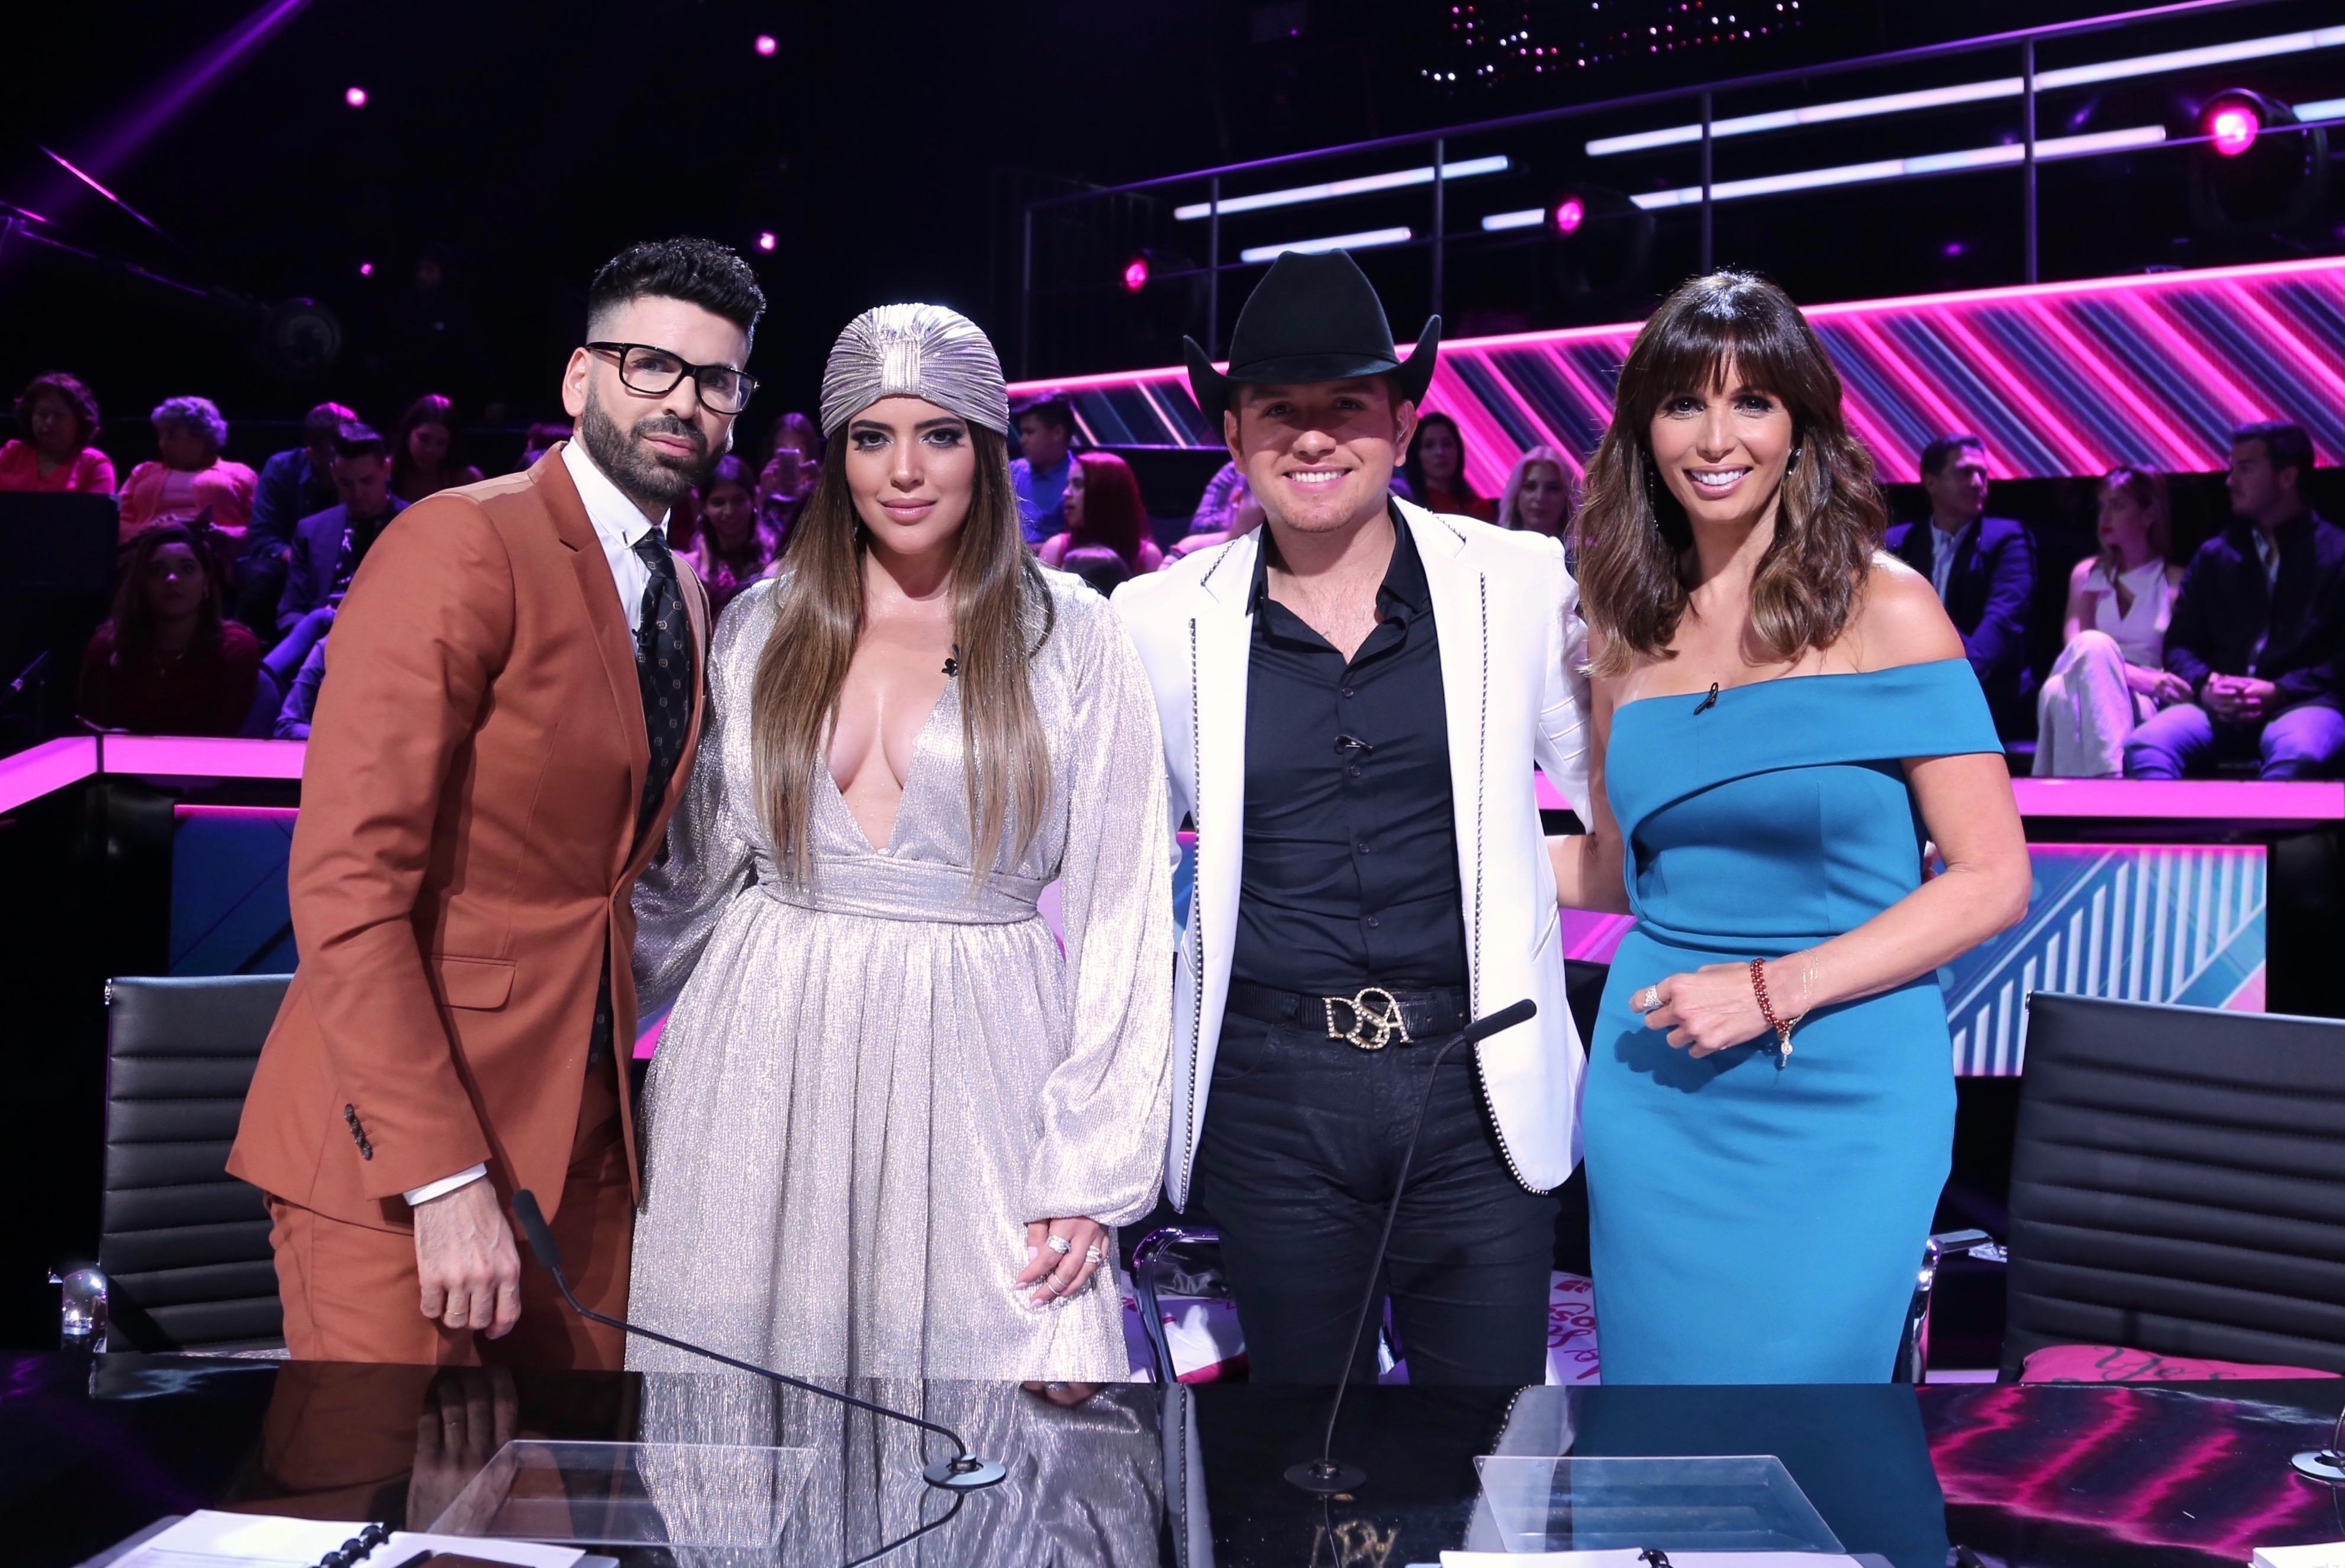 Jomari Goyso, Denise Bidot, El Dasa, Giselle Blondet